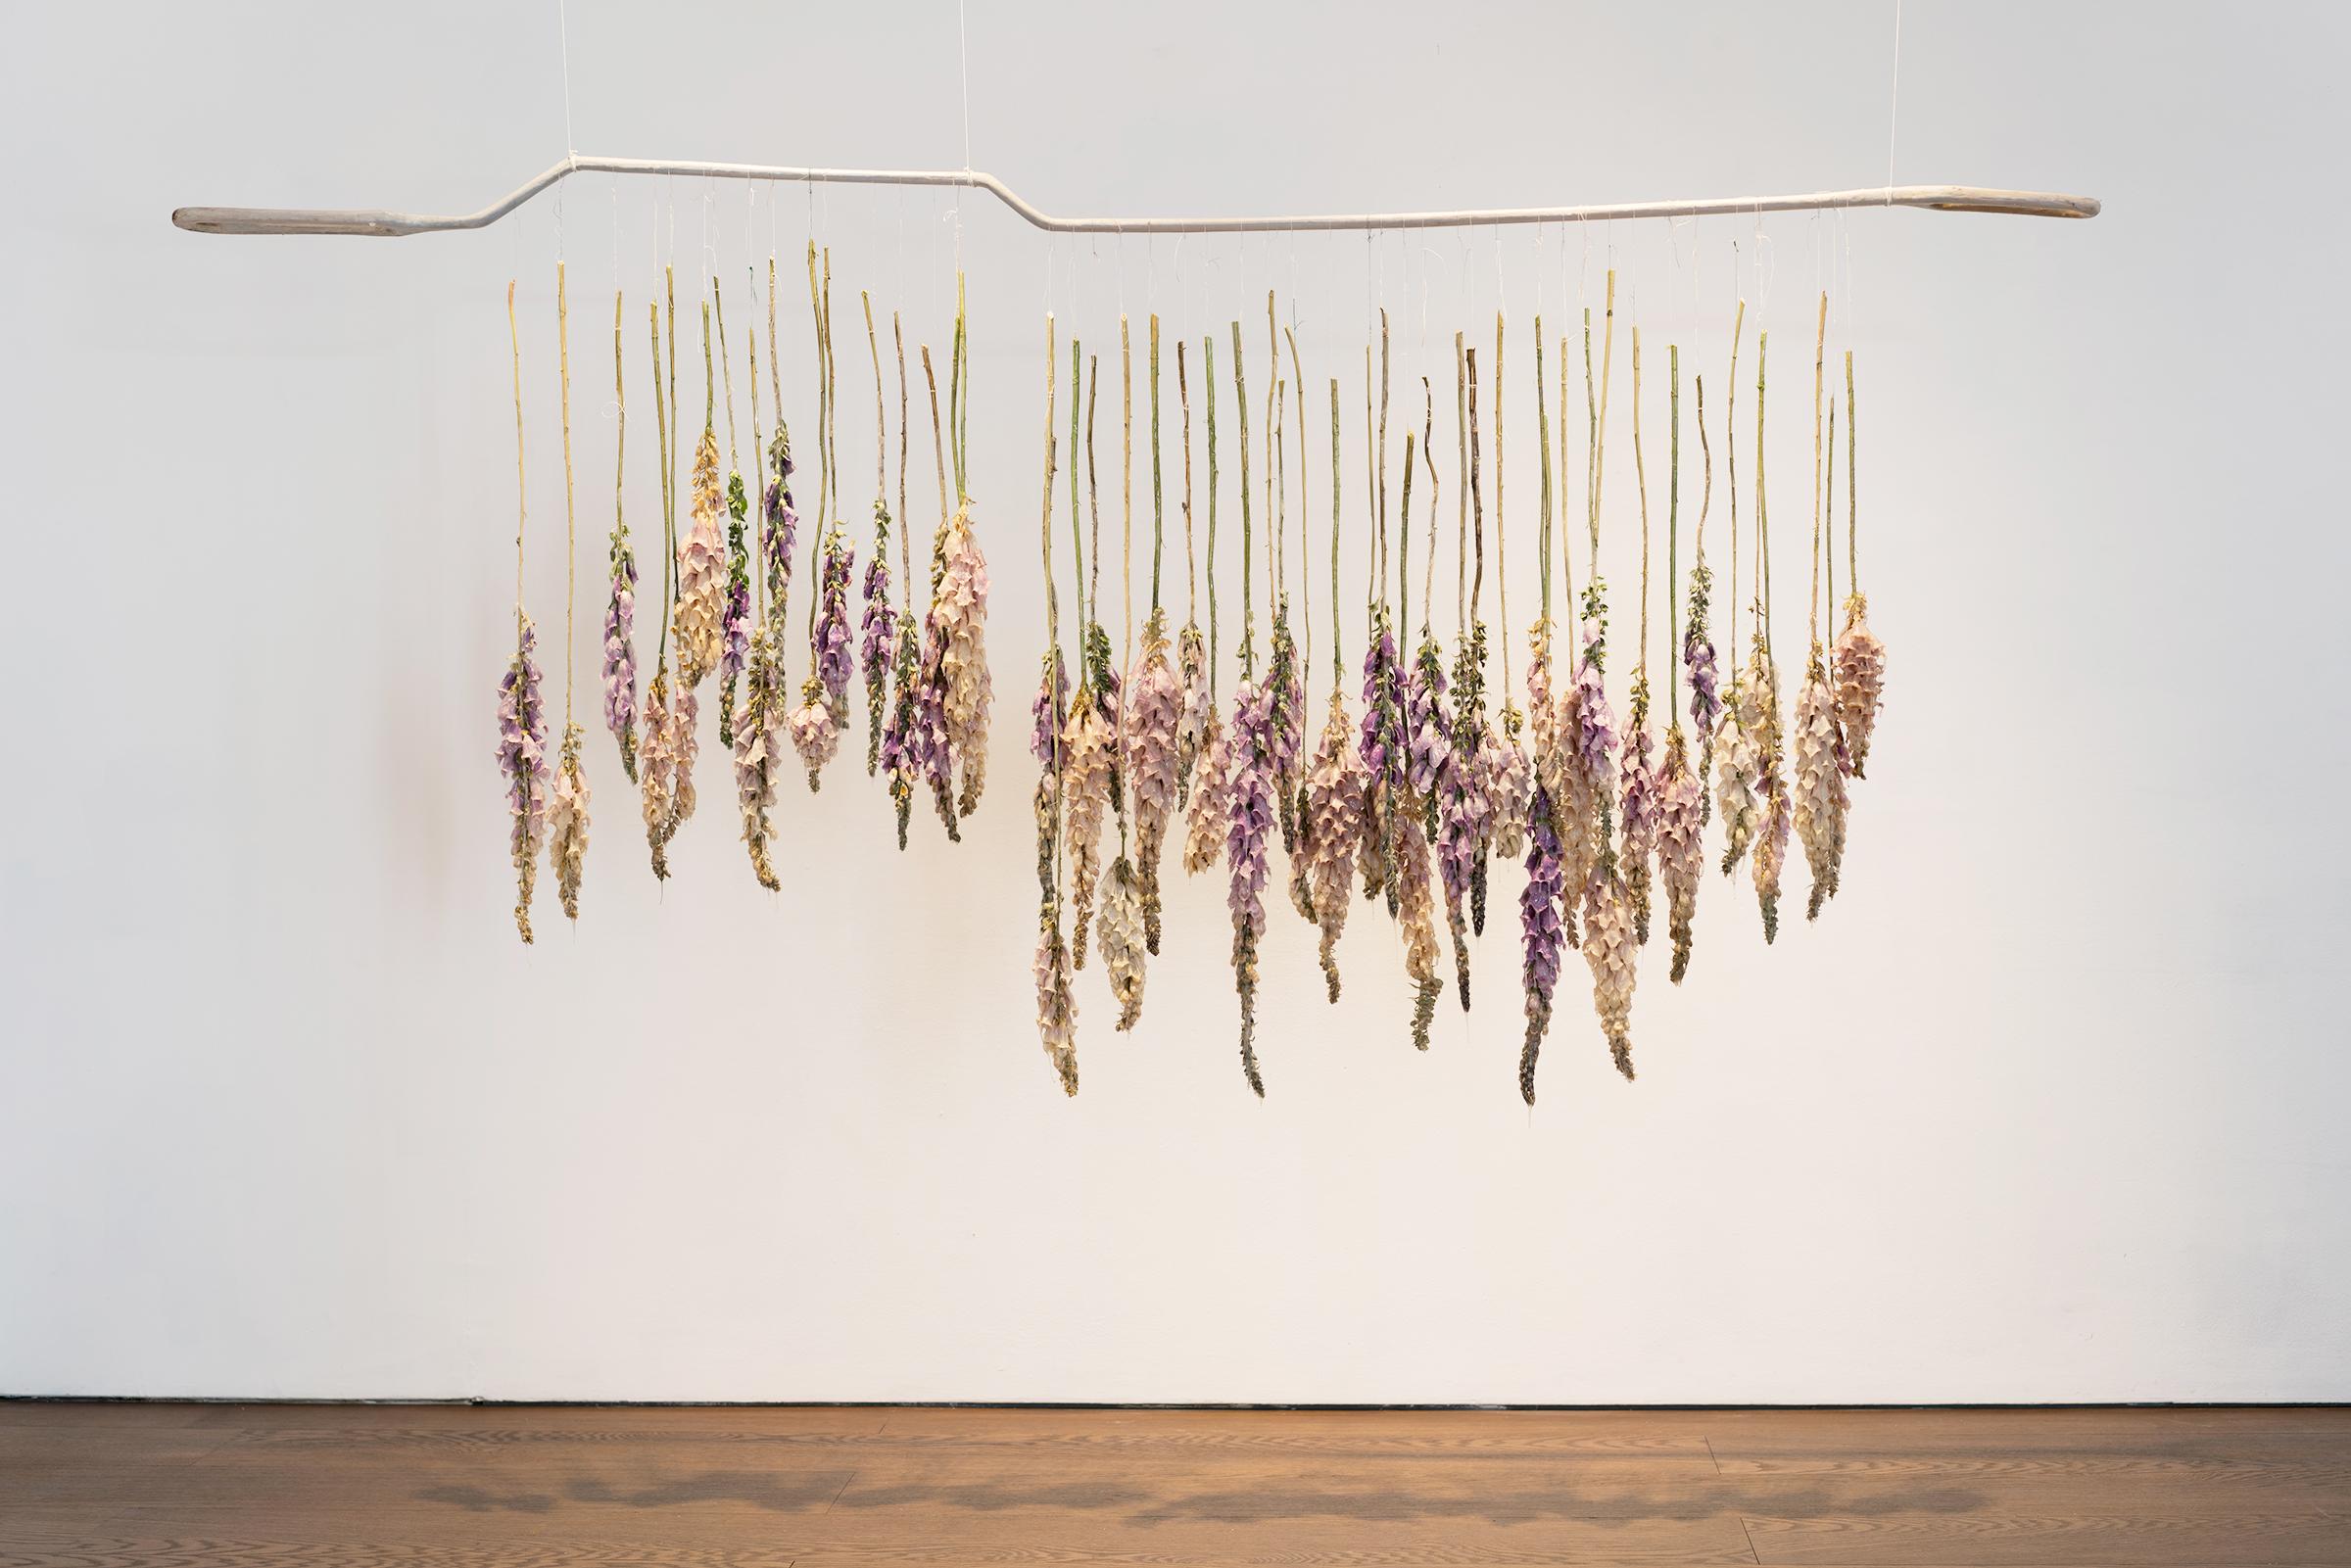 Miriam Austin, Solanum at Flowers Gallery, 2017. Installation view